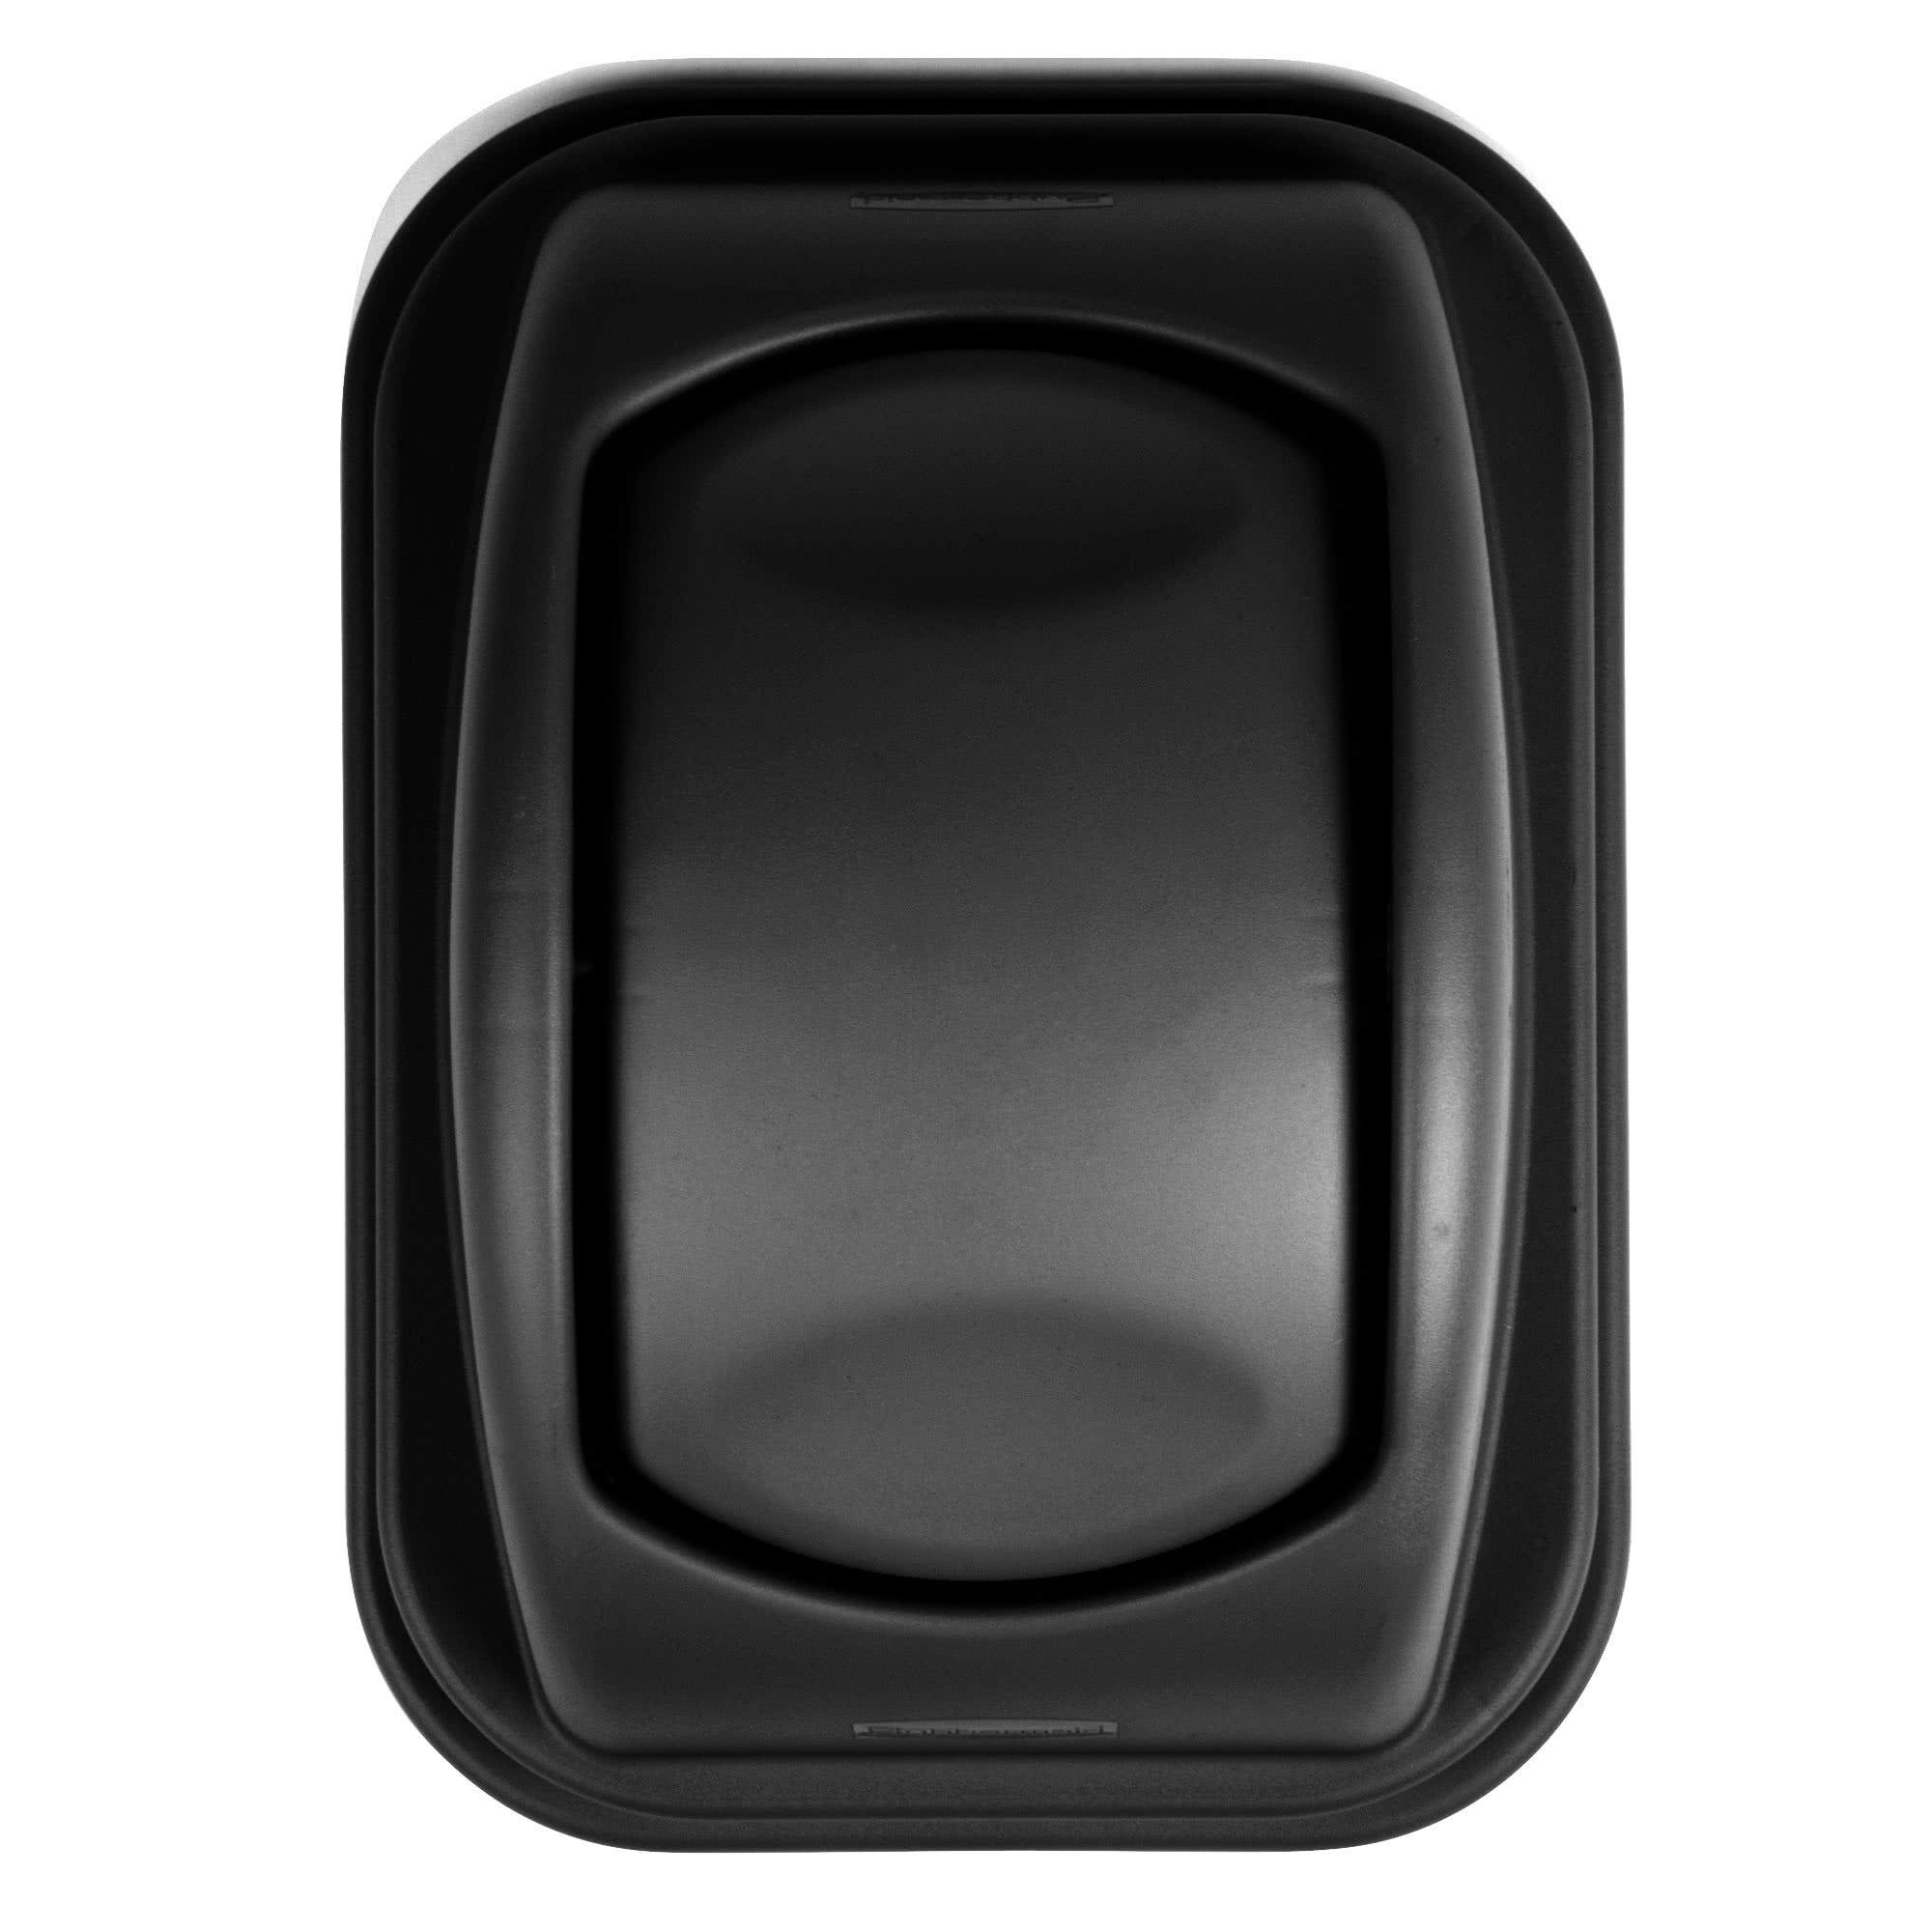 Rubbermaid FG306700BLA tapa untouchable soft abatible color negro, aplica contenedor FG295700 de 10 galones  2